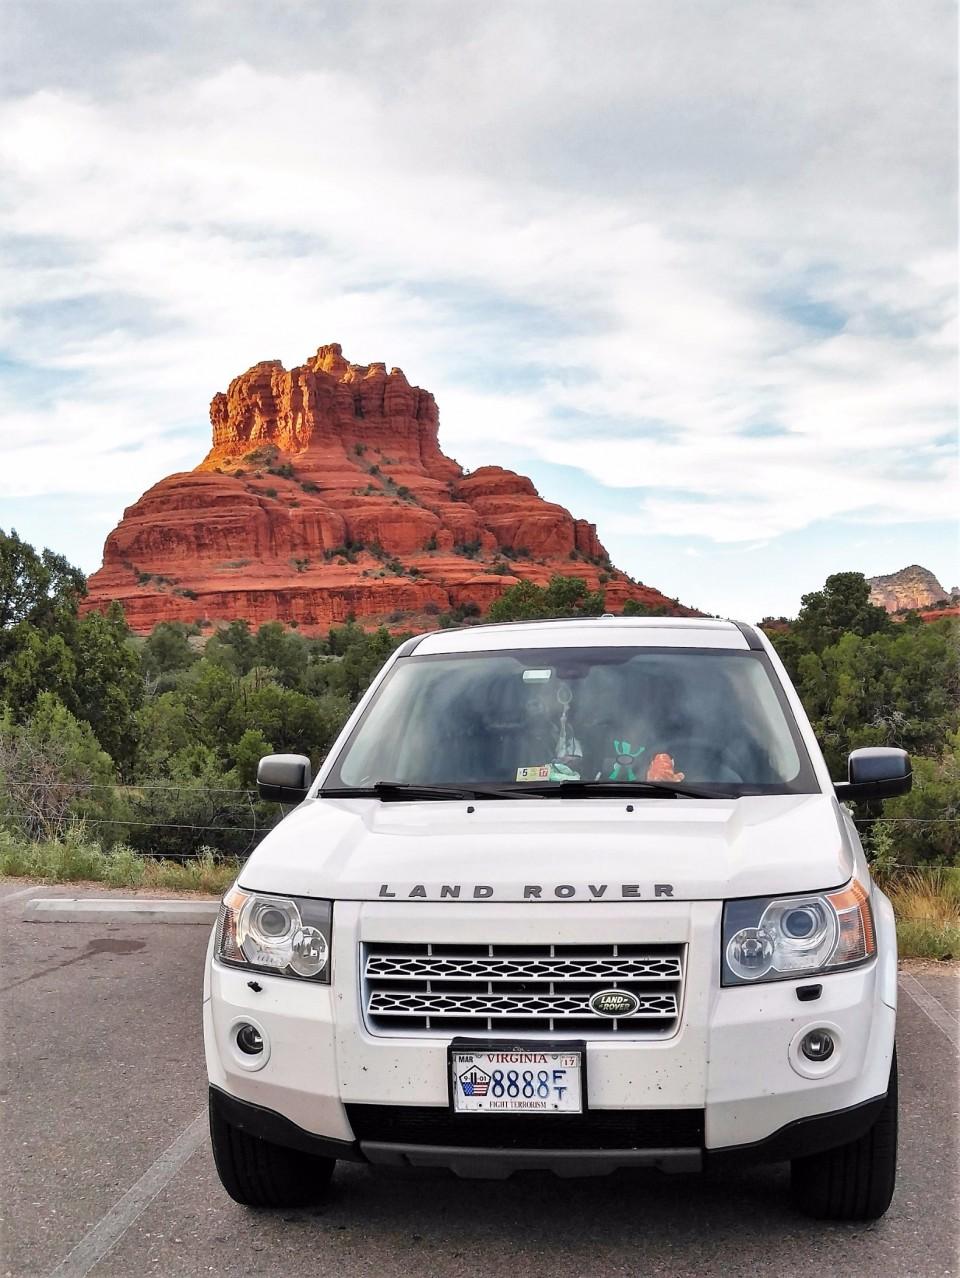 Shamanic Land Rover @ Bell Rock Sedona AZ 01 (2)